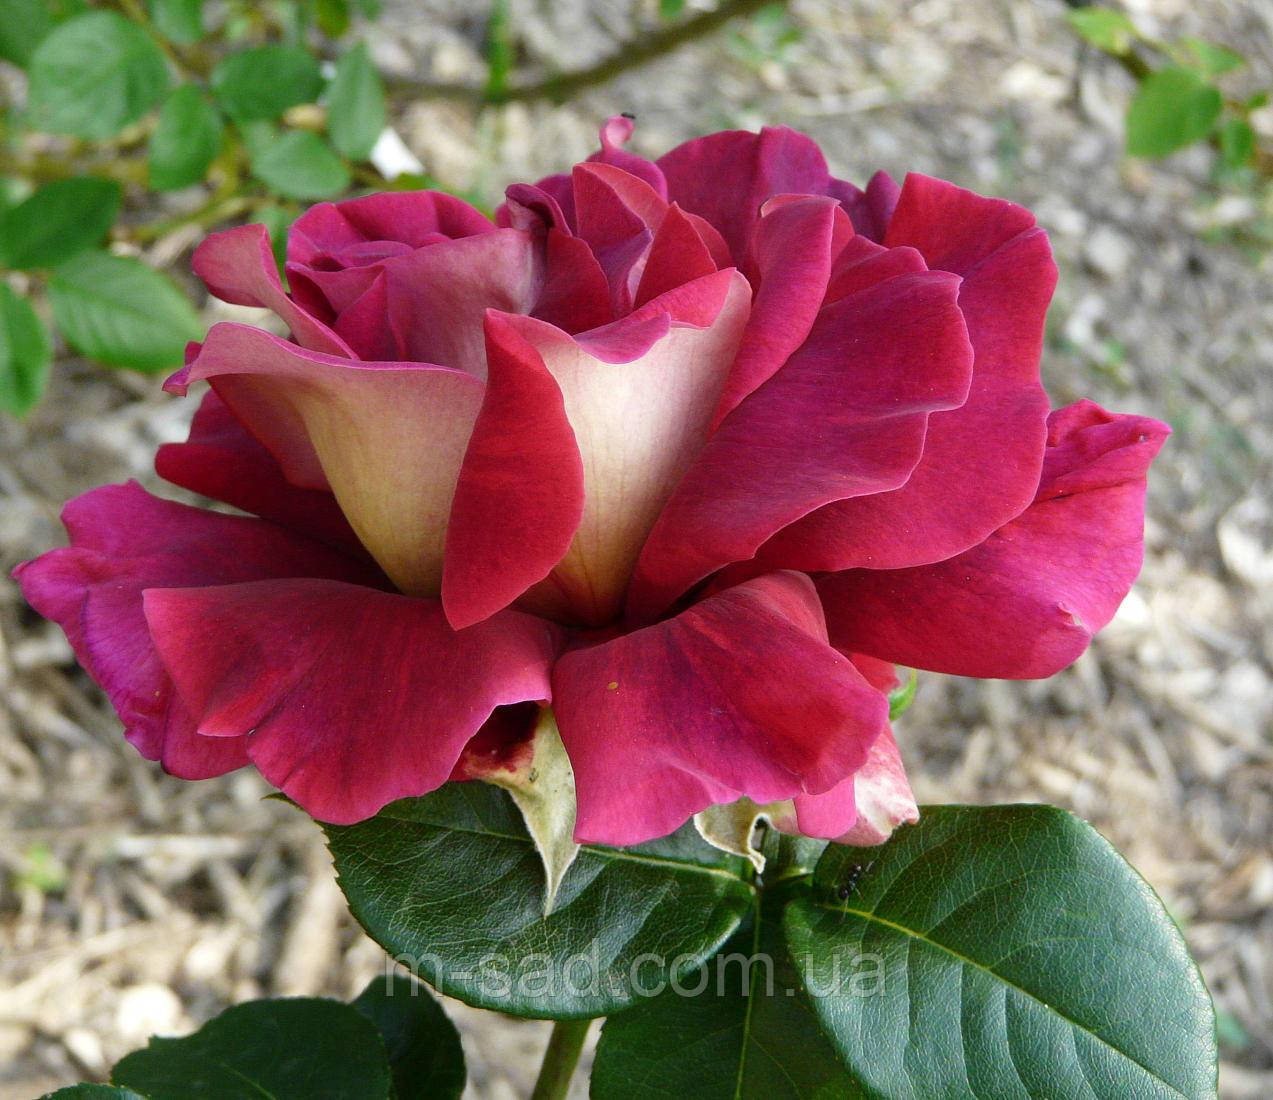 Саженцы роз Кроненбург